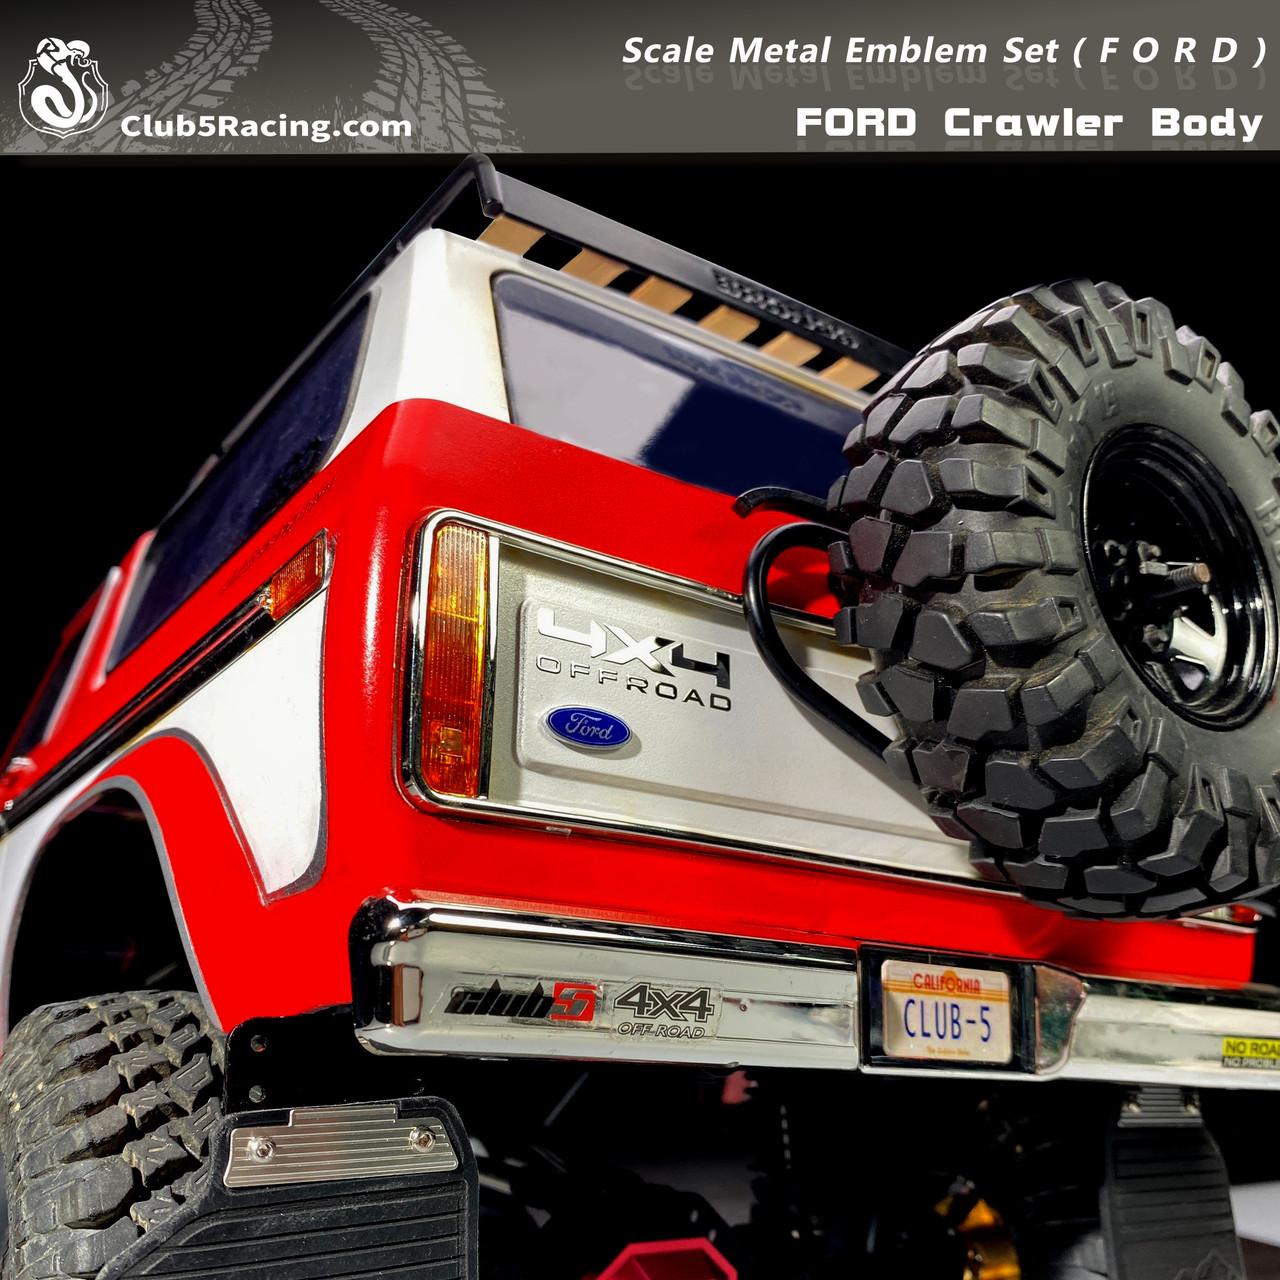 Scale Metal Emblem Set ( F O R D ) for FORD Crawler Body